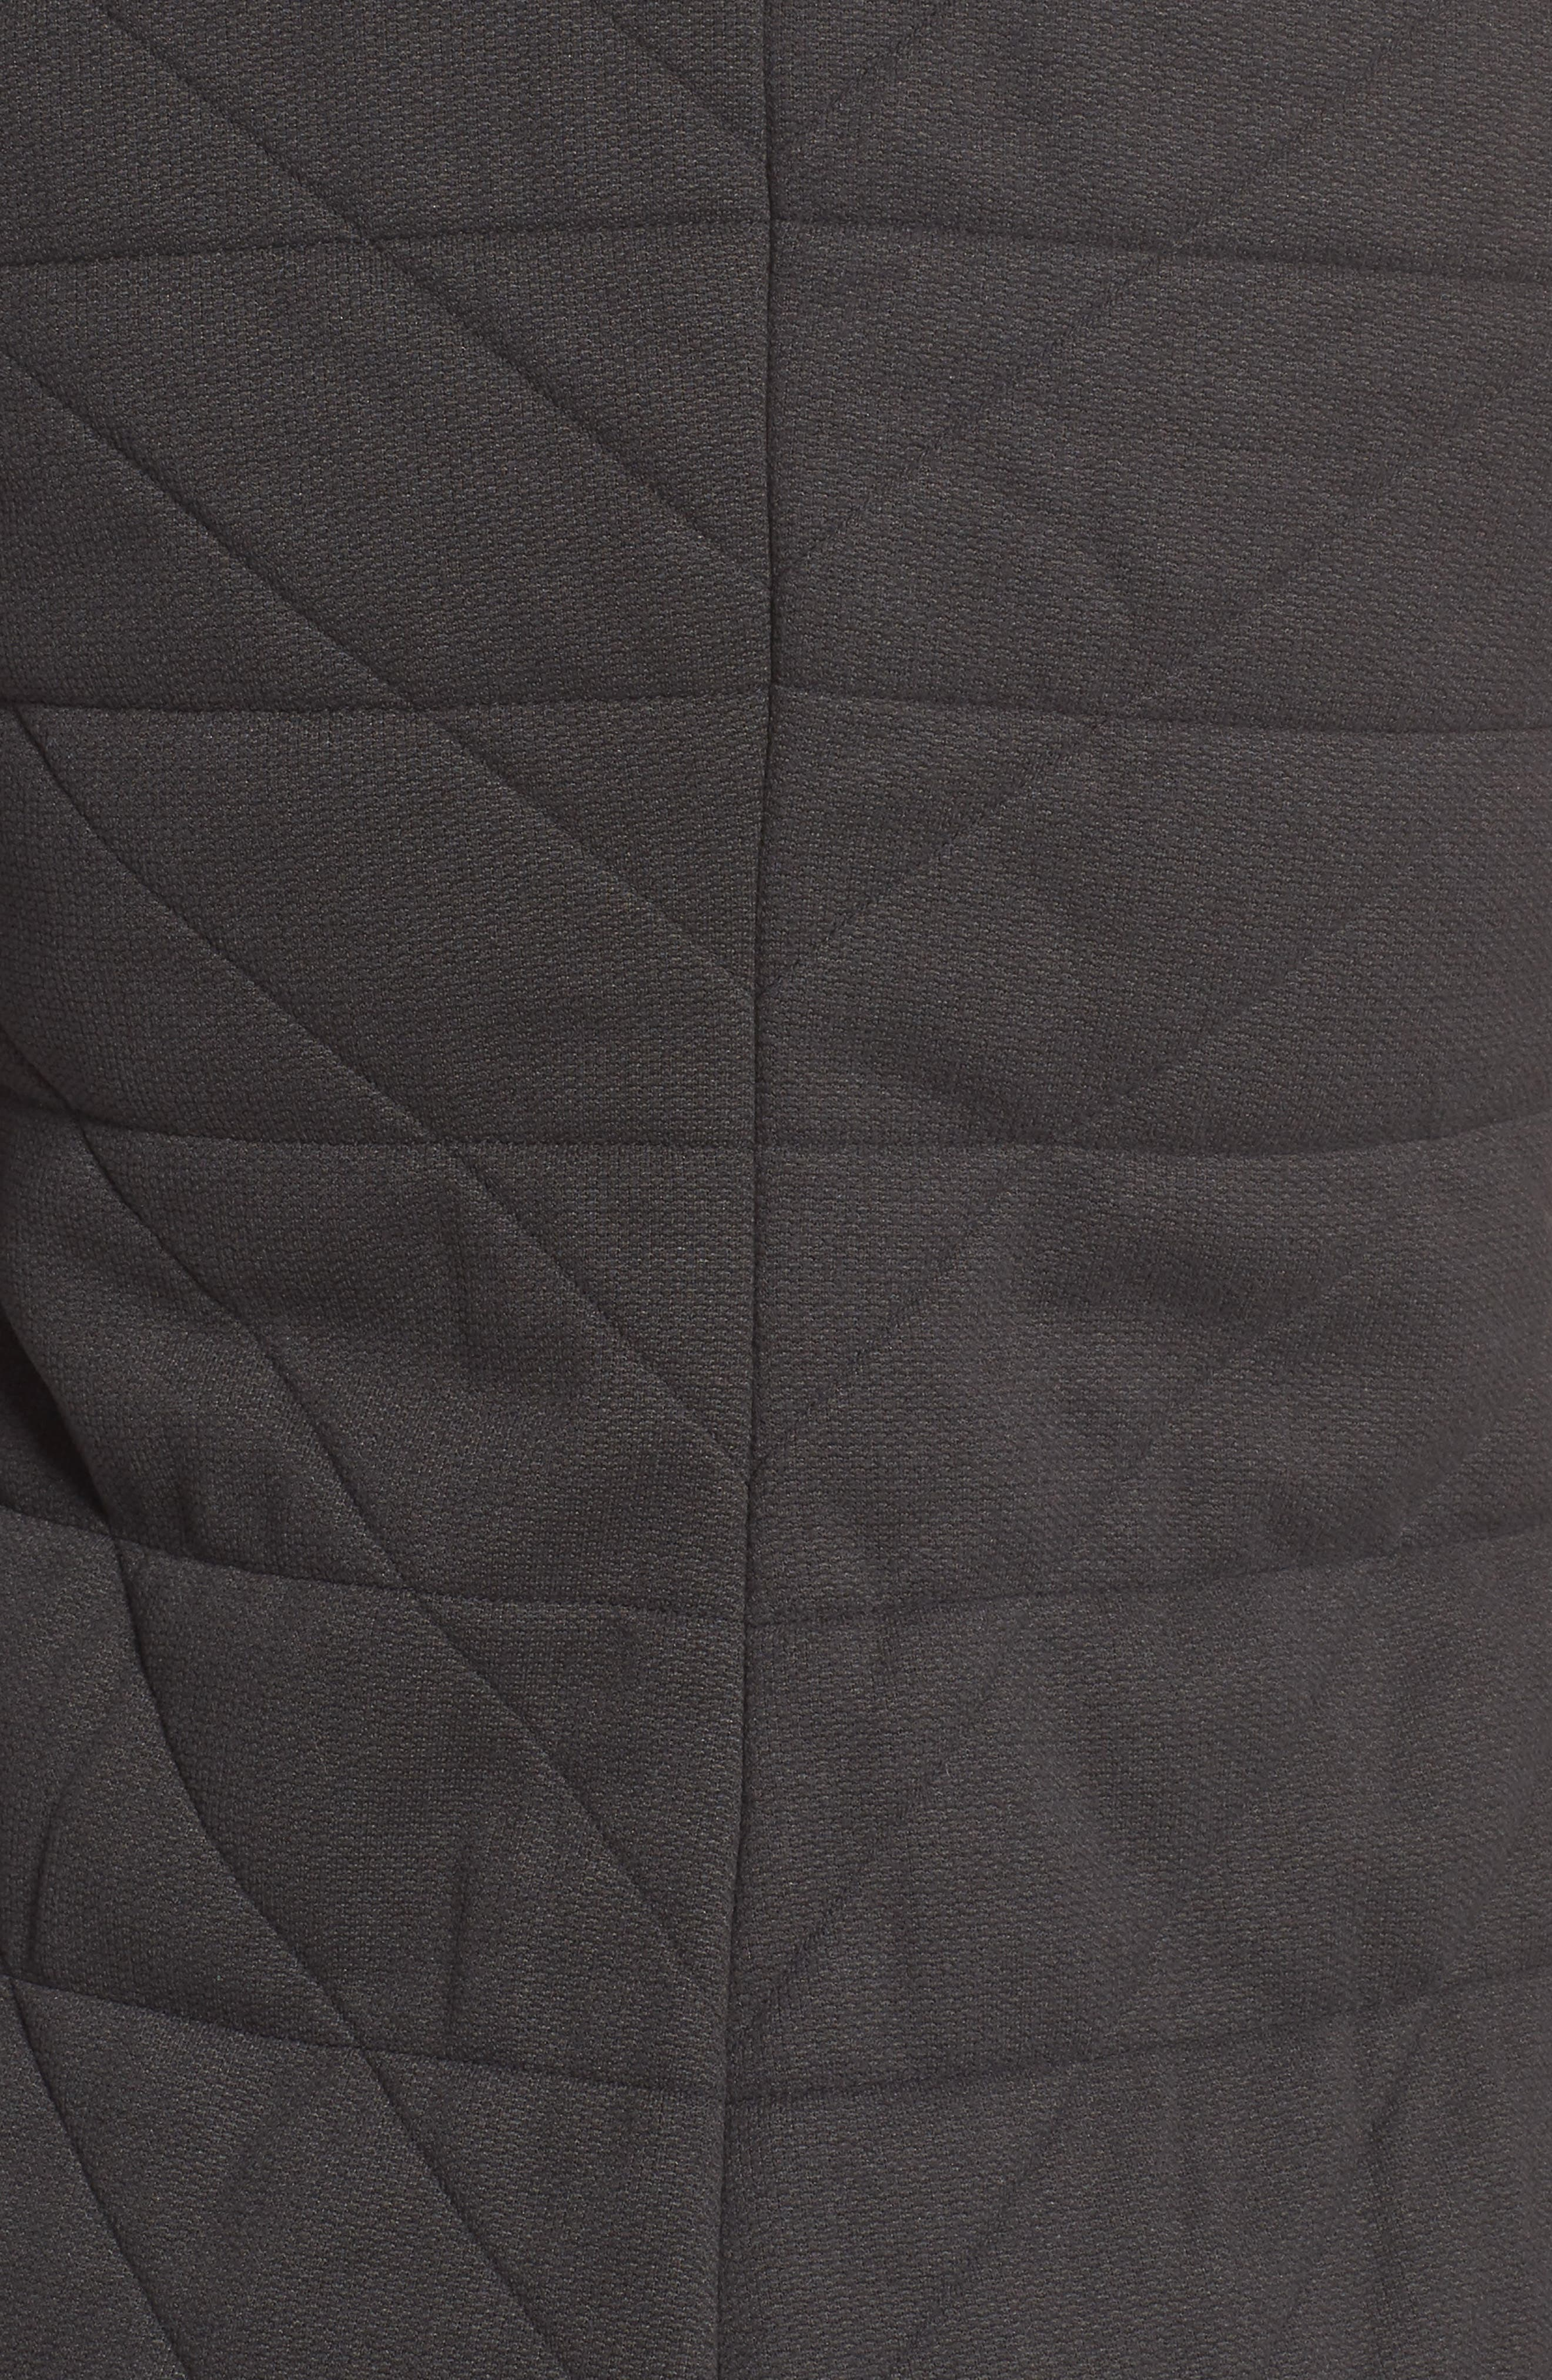 Fleece Jacket,                             Alternate thumbnail 7, color,                             001